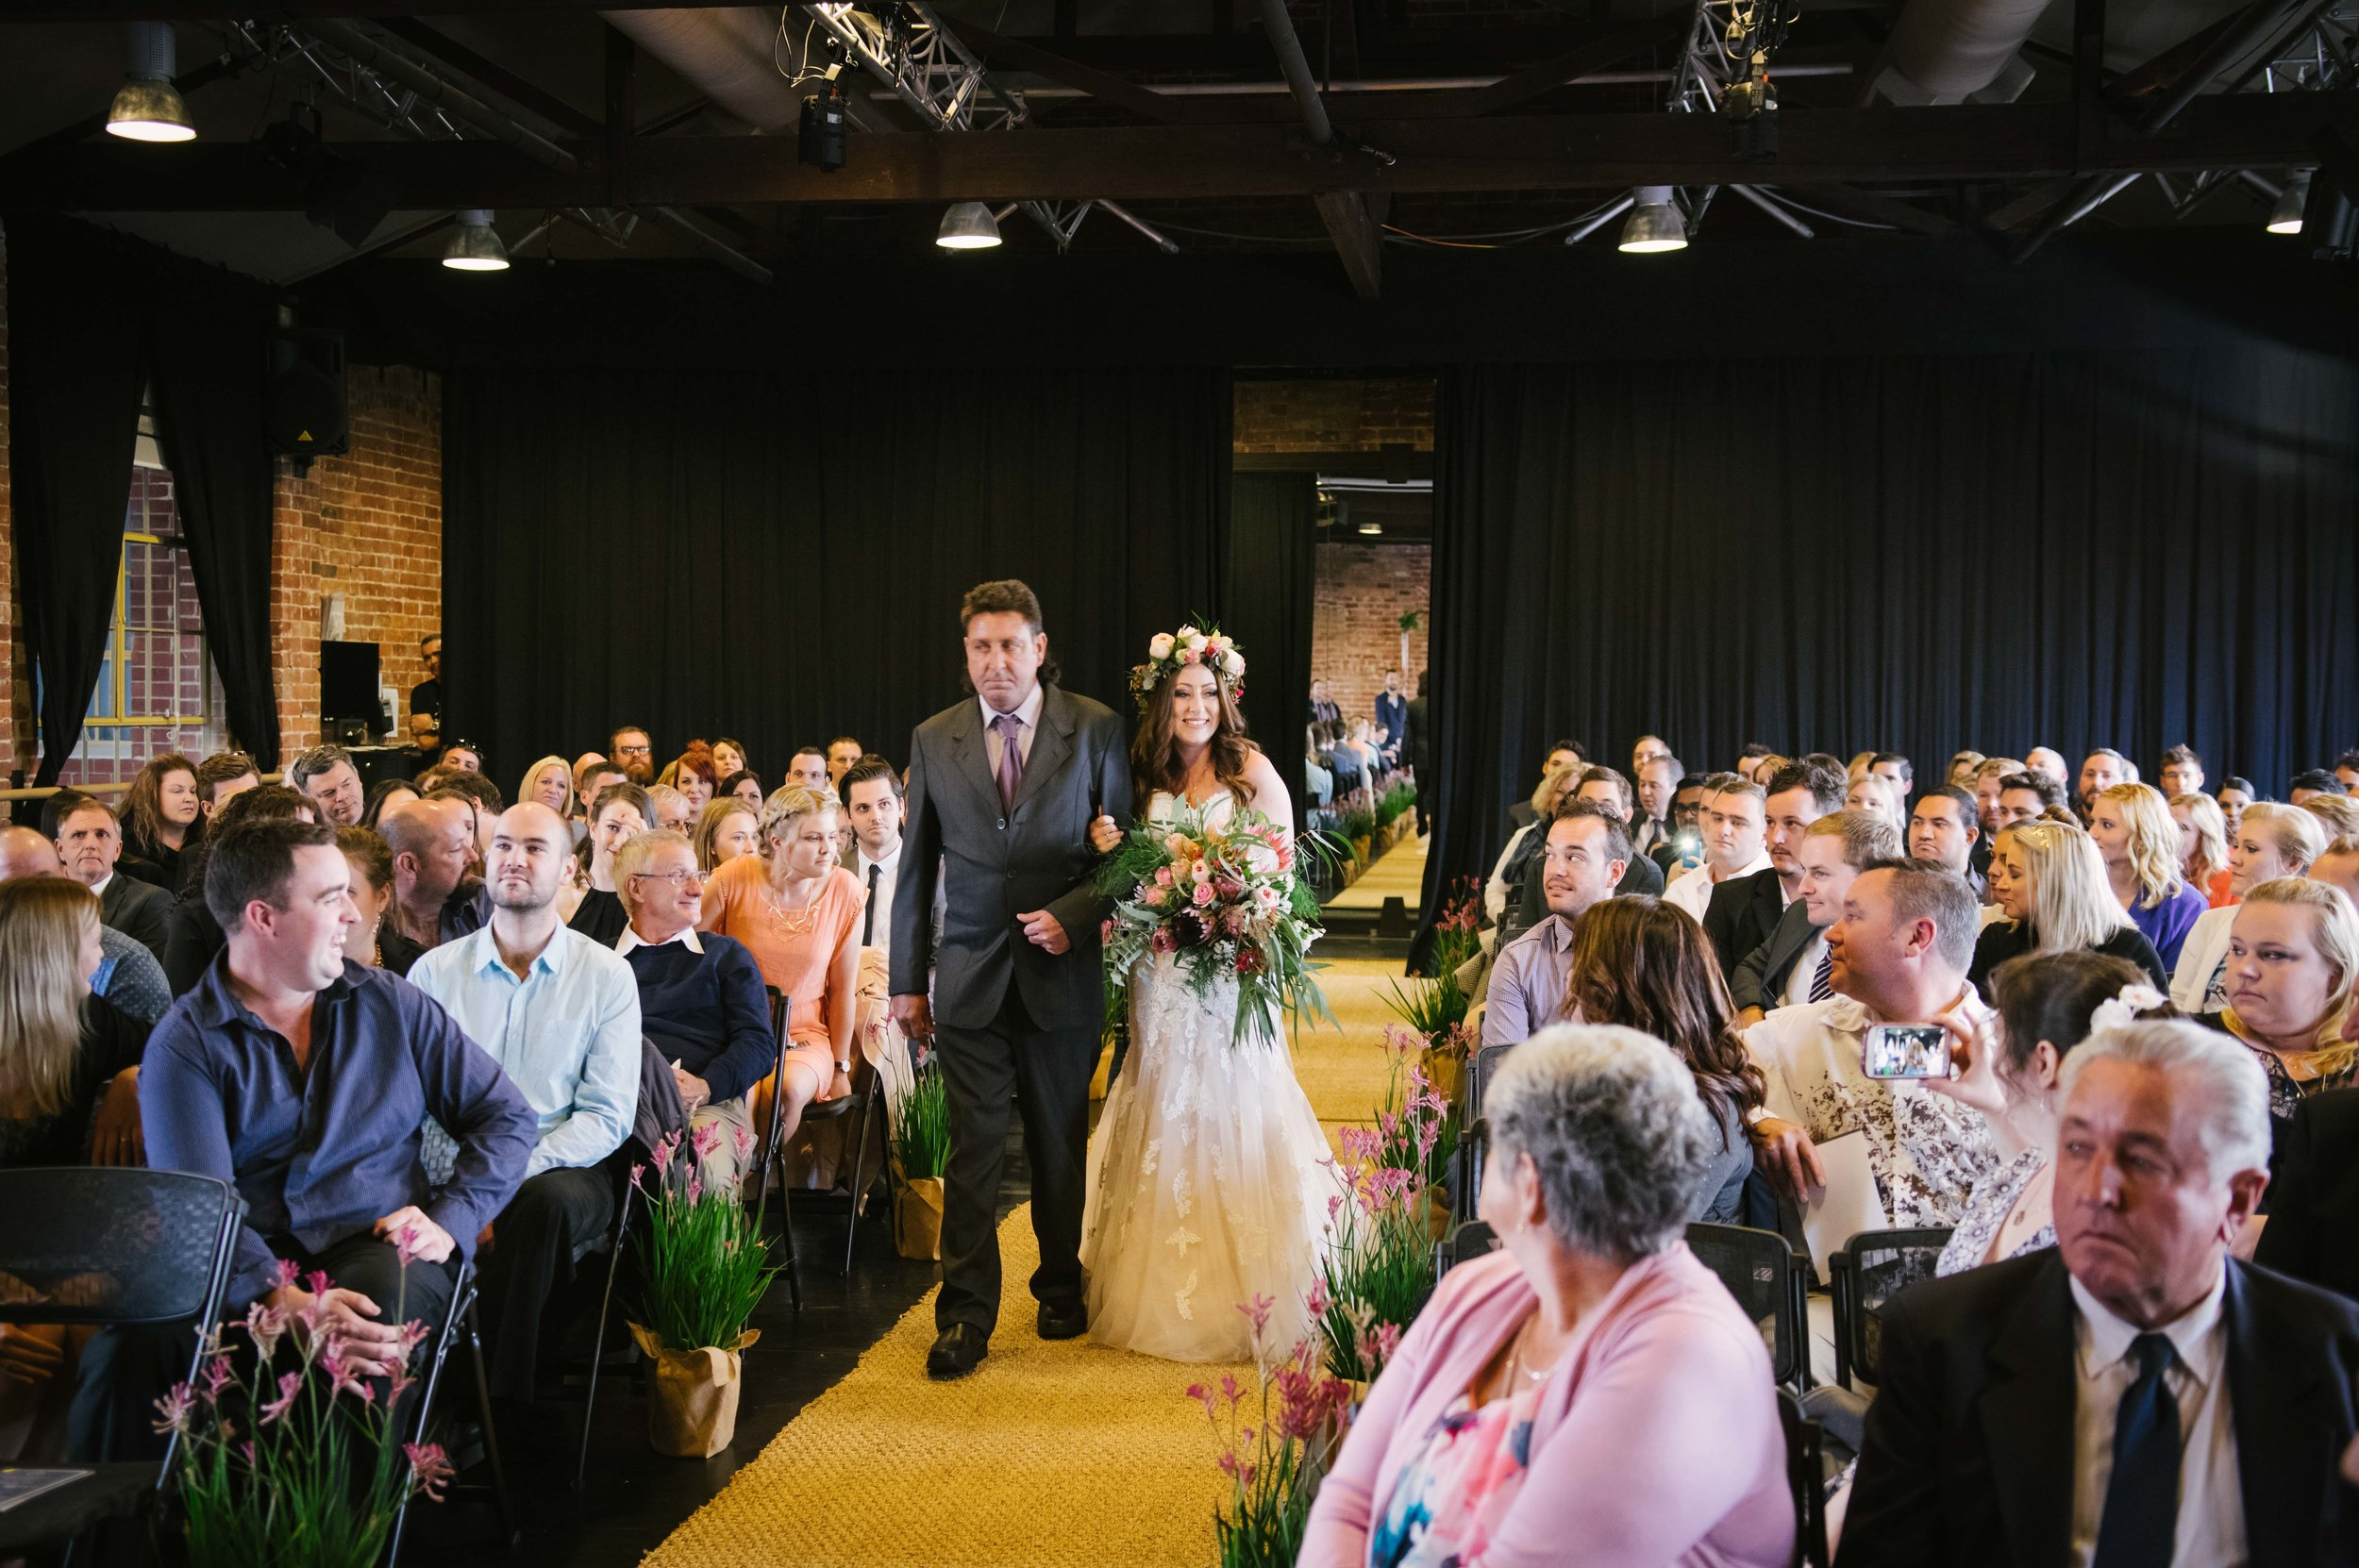 WA Ballet Centre Swan Valley Oakover Grounds Perth Wheatbelt Avon Valley Wedding Photographer (16).jpg